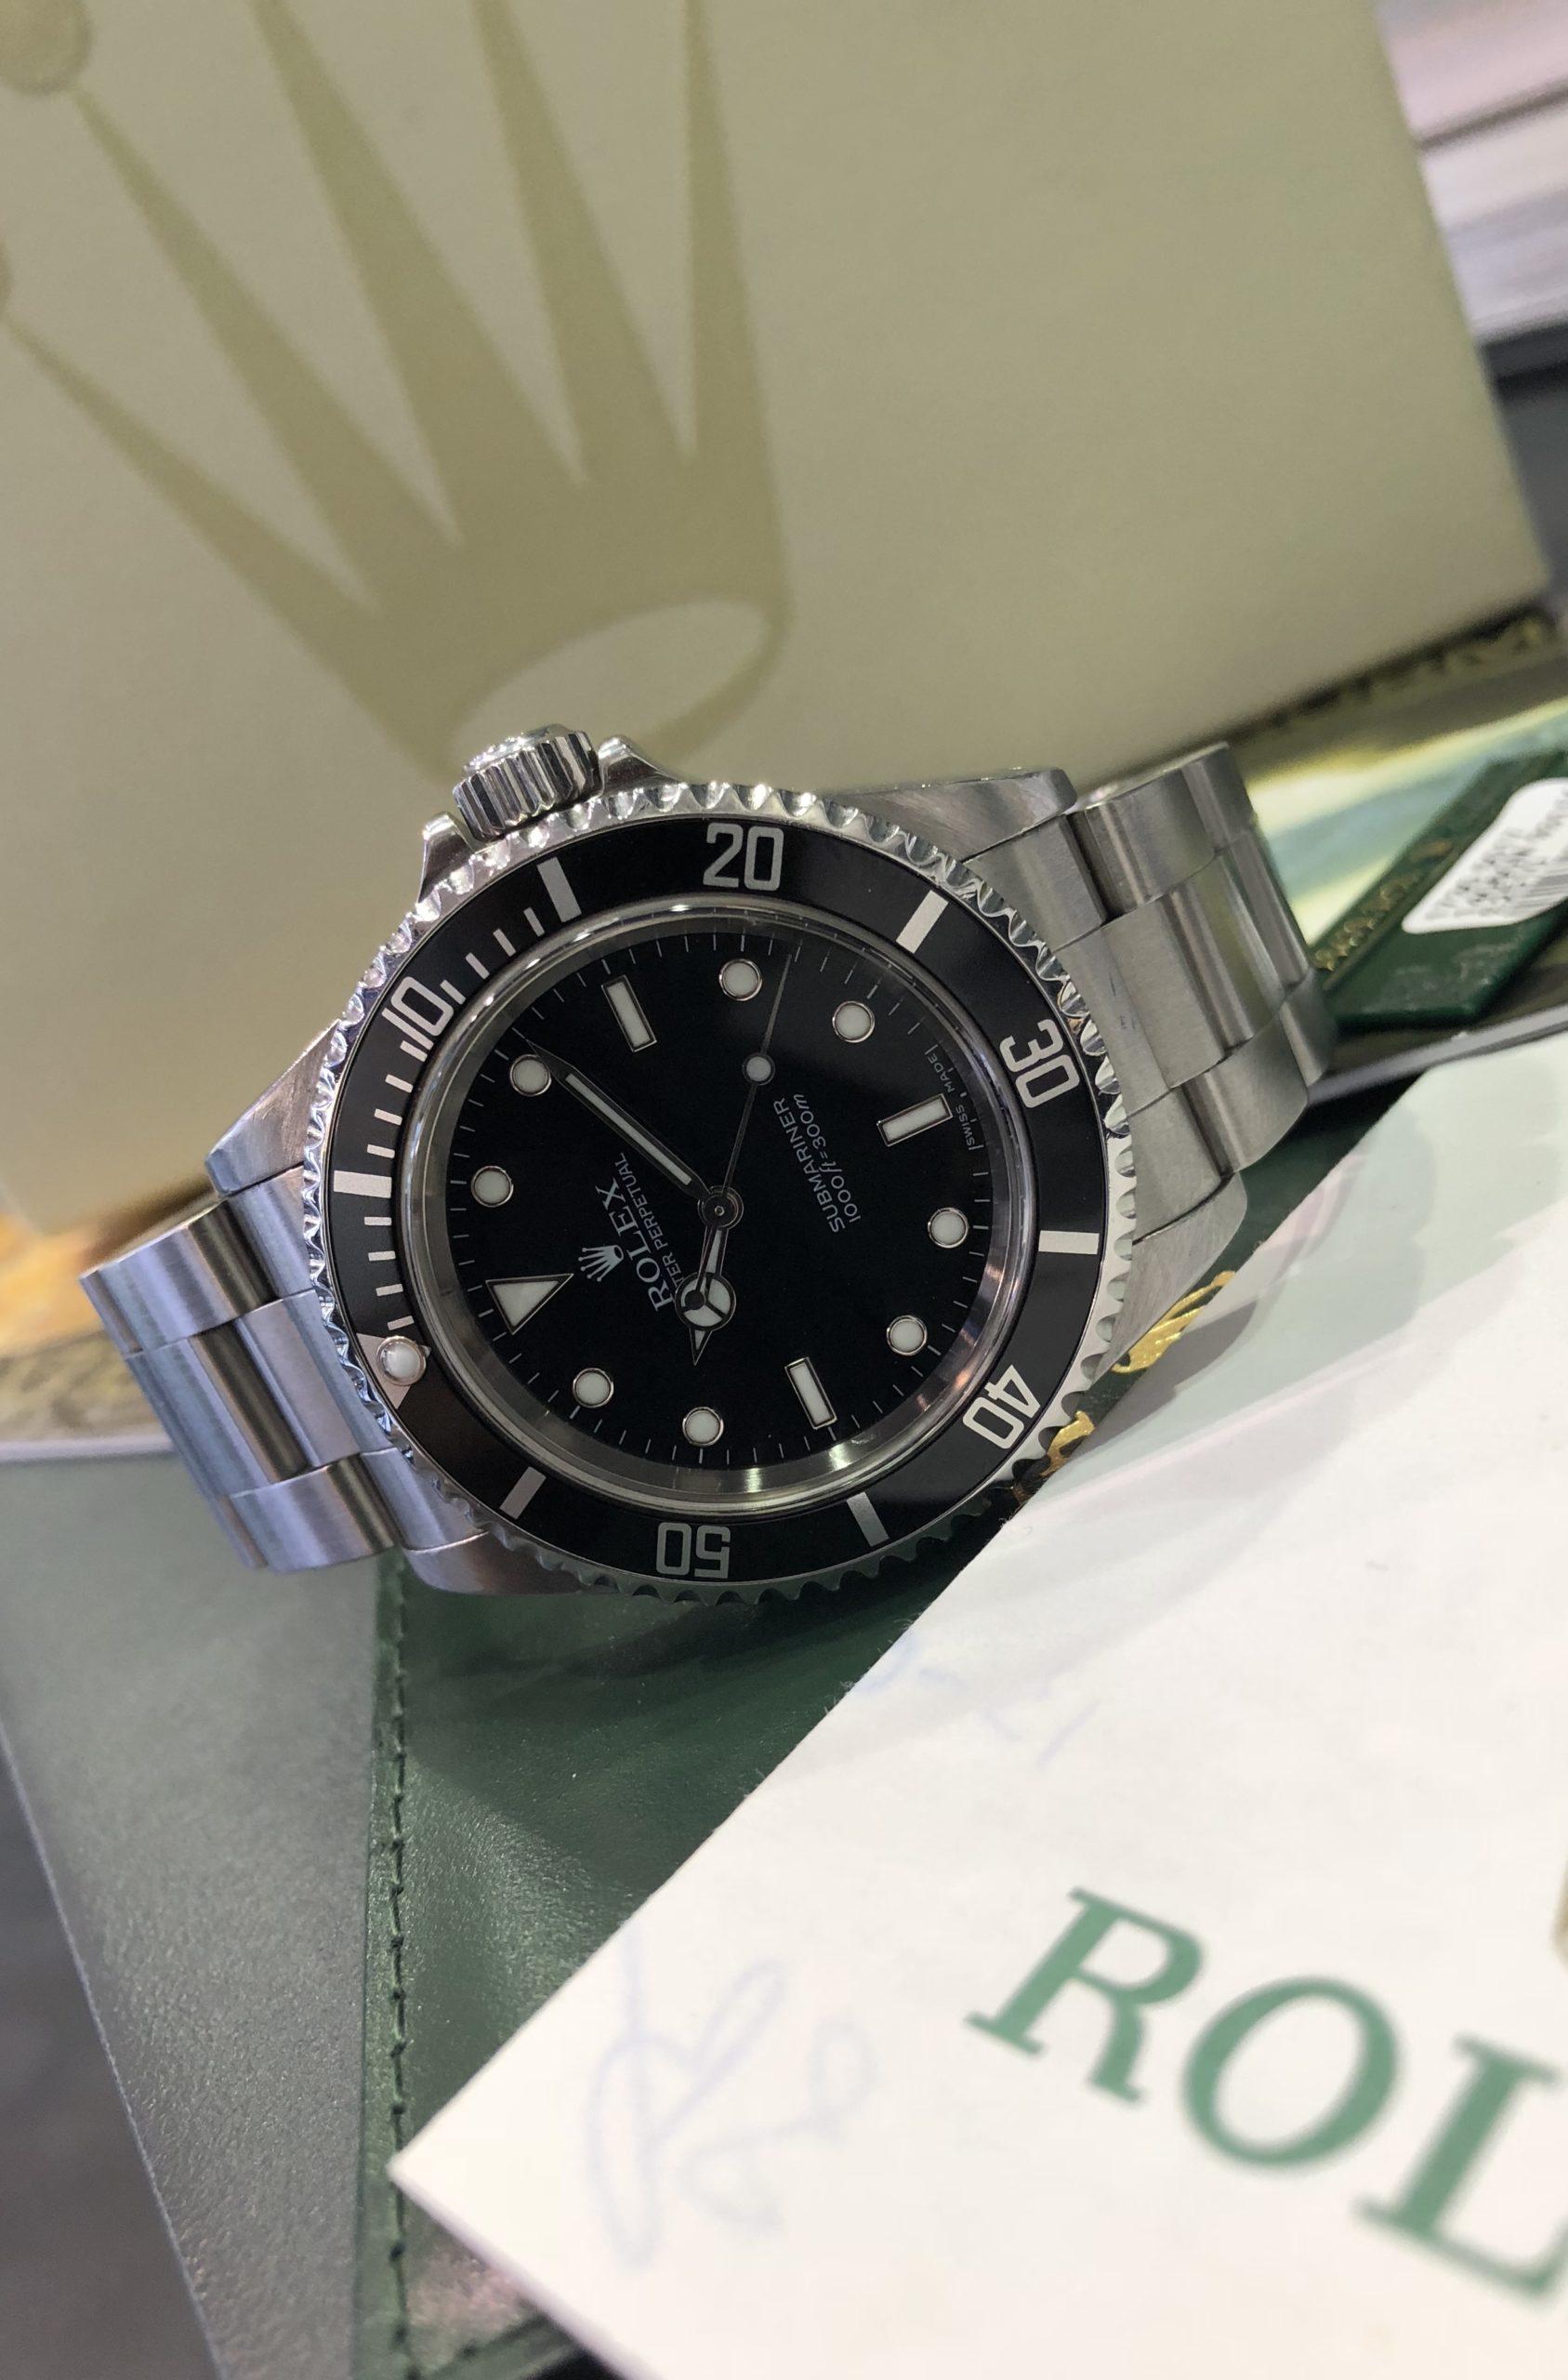 ROLEX SUBMARINER NON DATE 2 LINE 14060 - Carr Watches